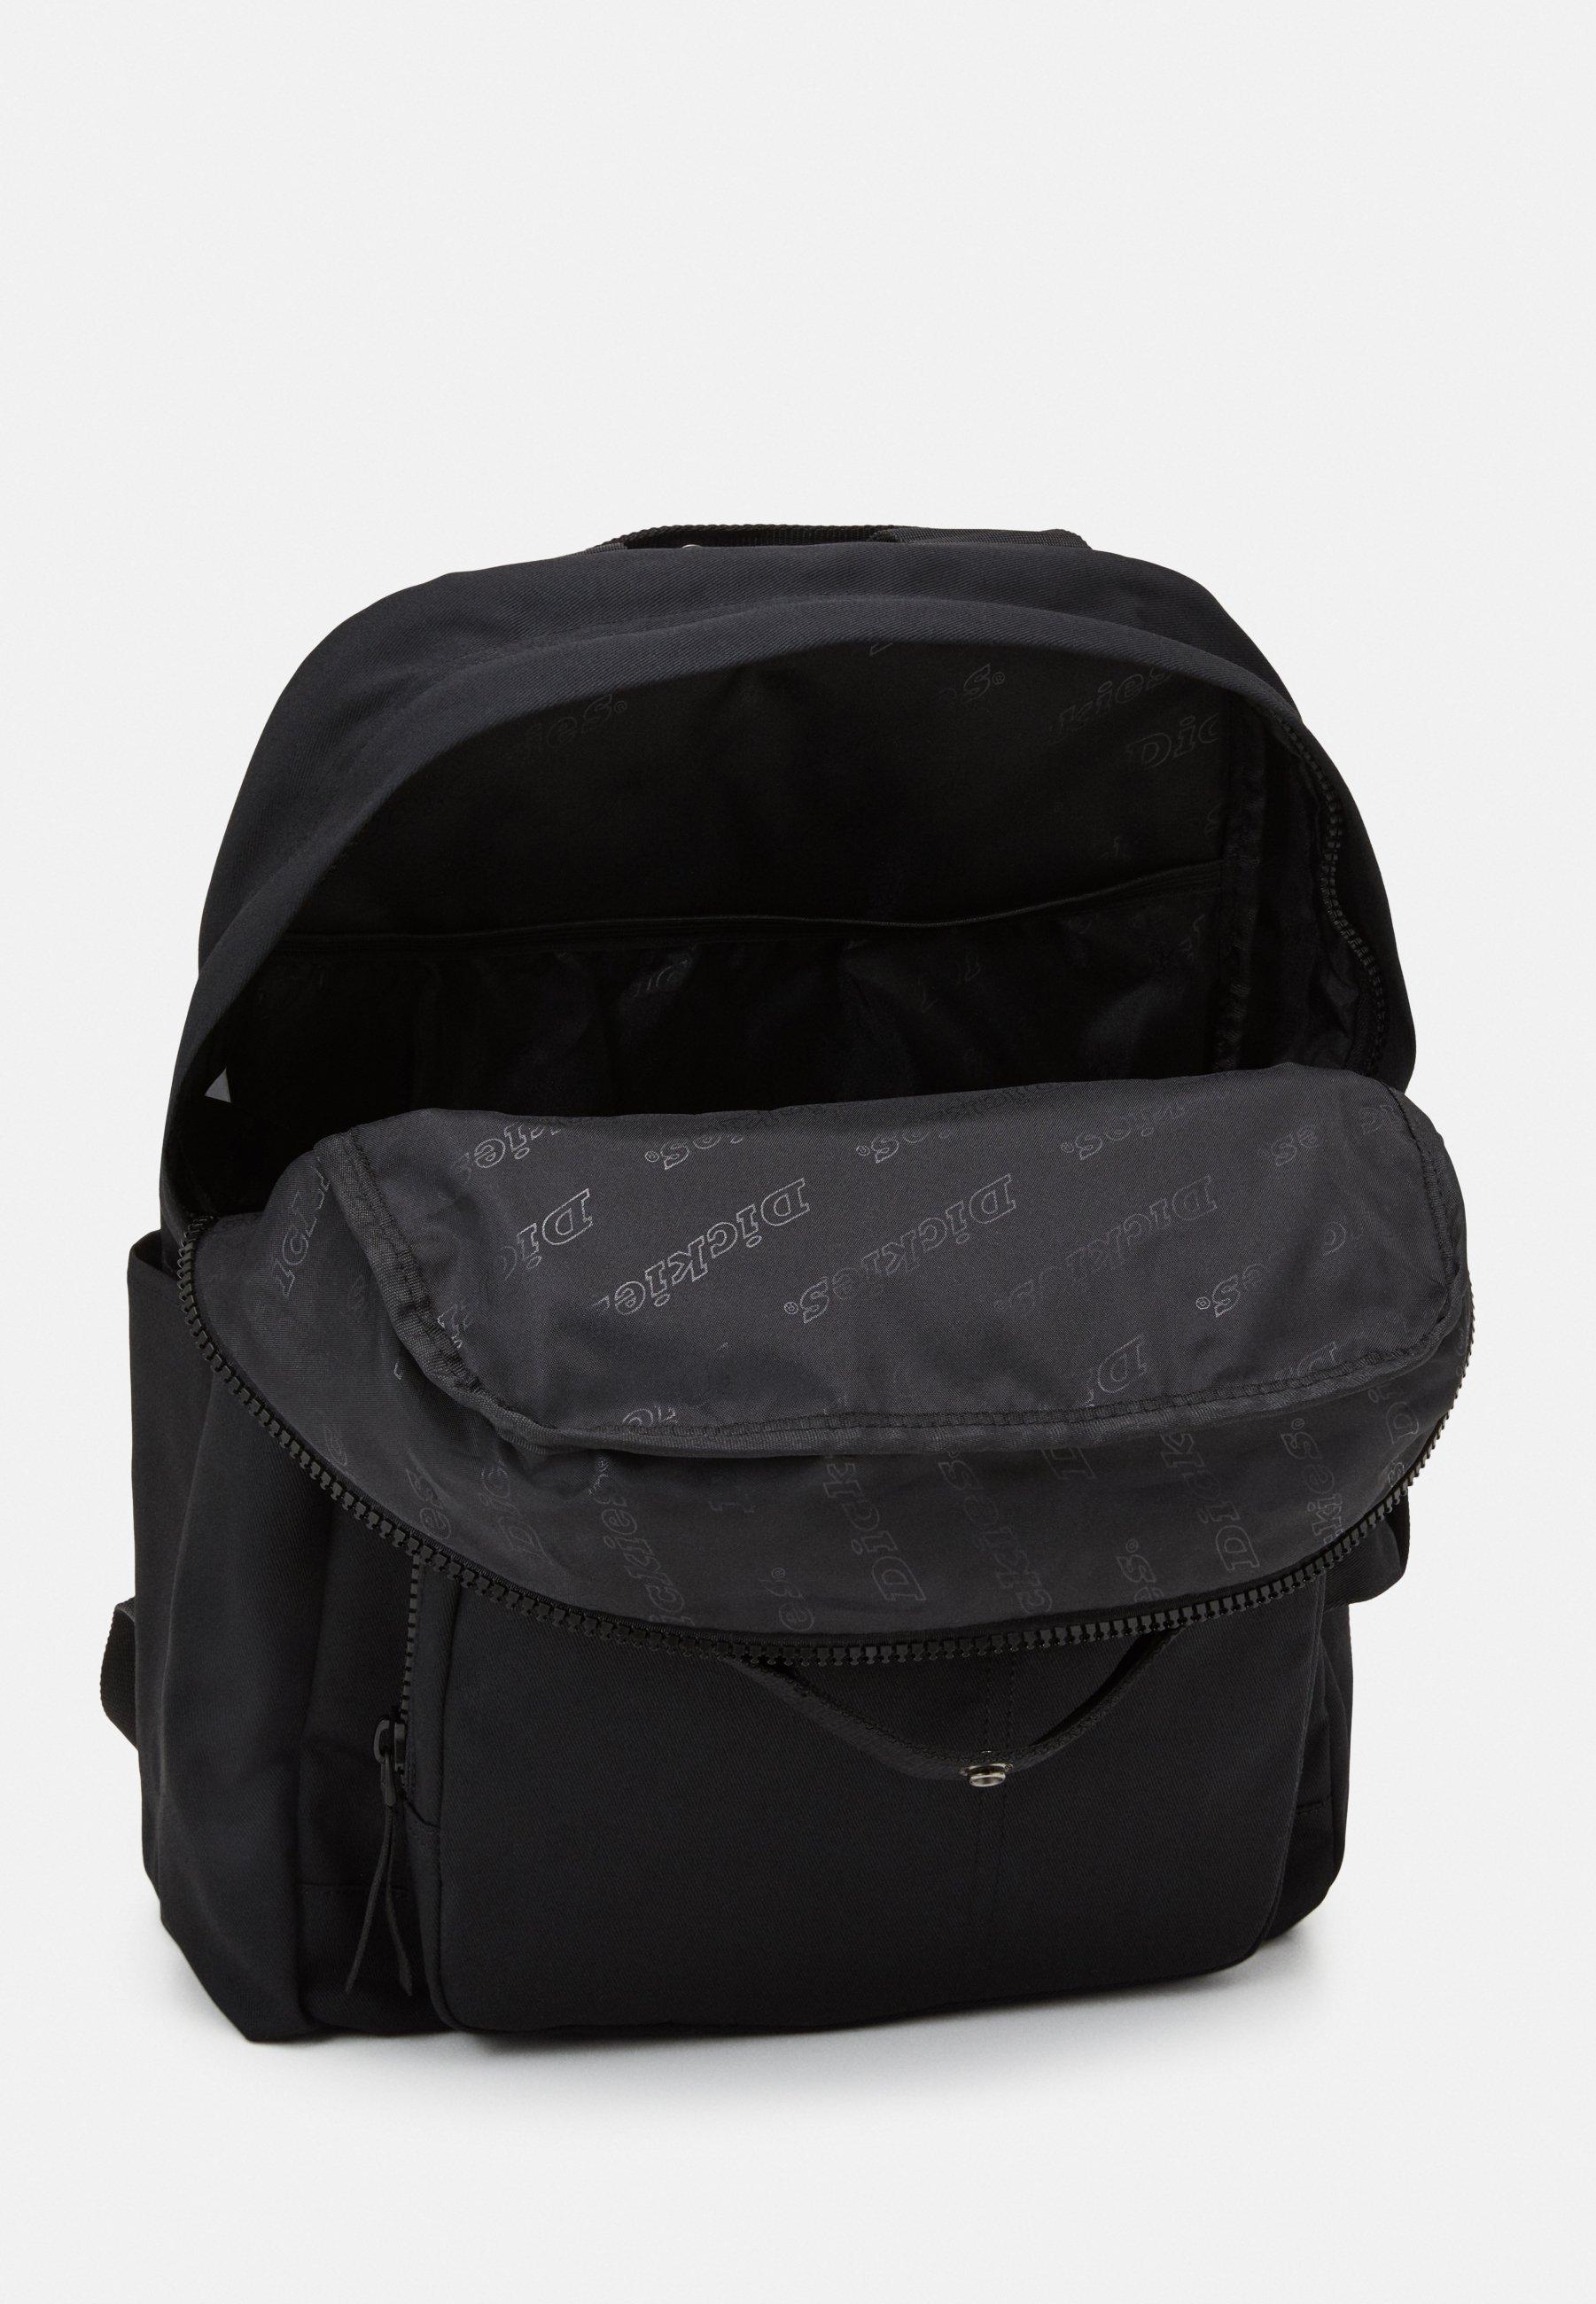 Dickies LISBON - Tagesrucksack - black/schwarz - Herrentaschen 2R7IY